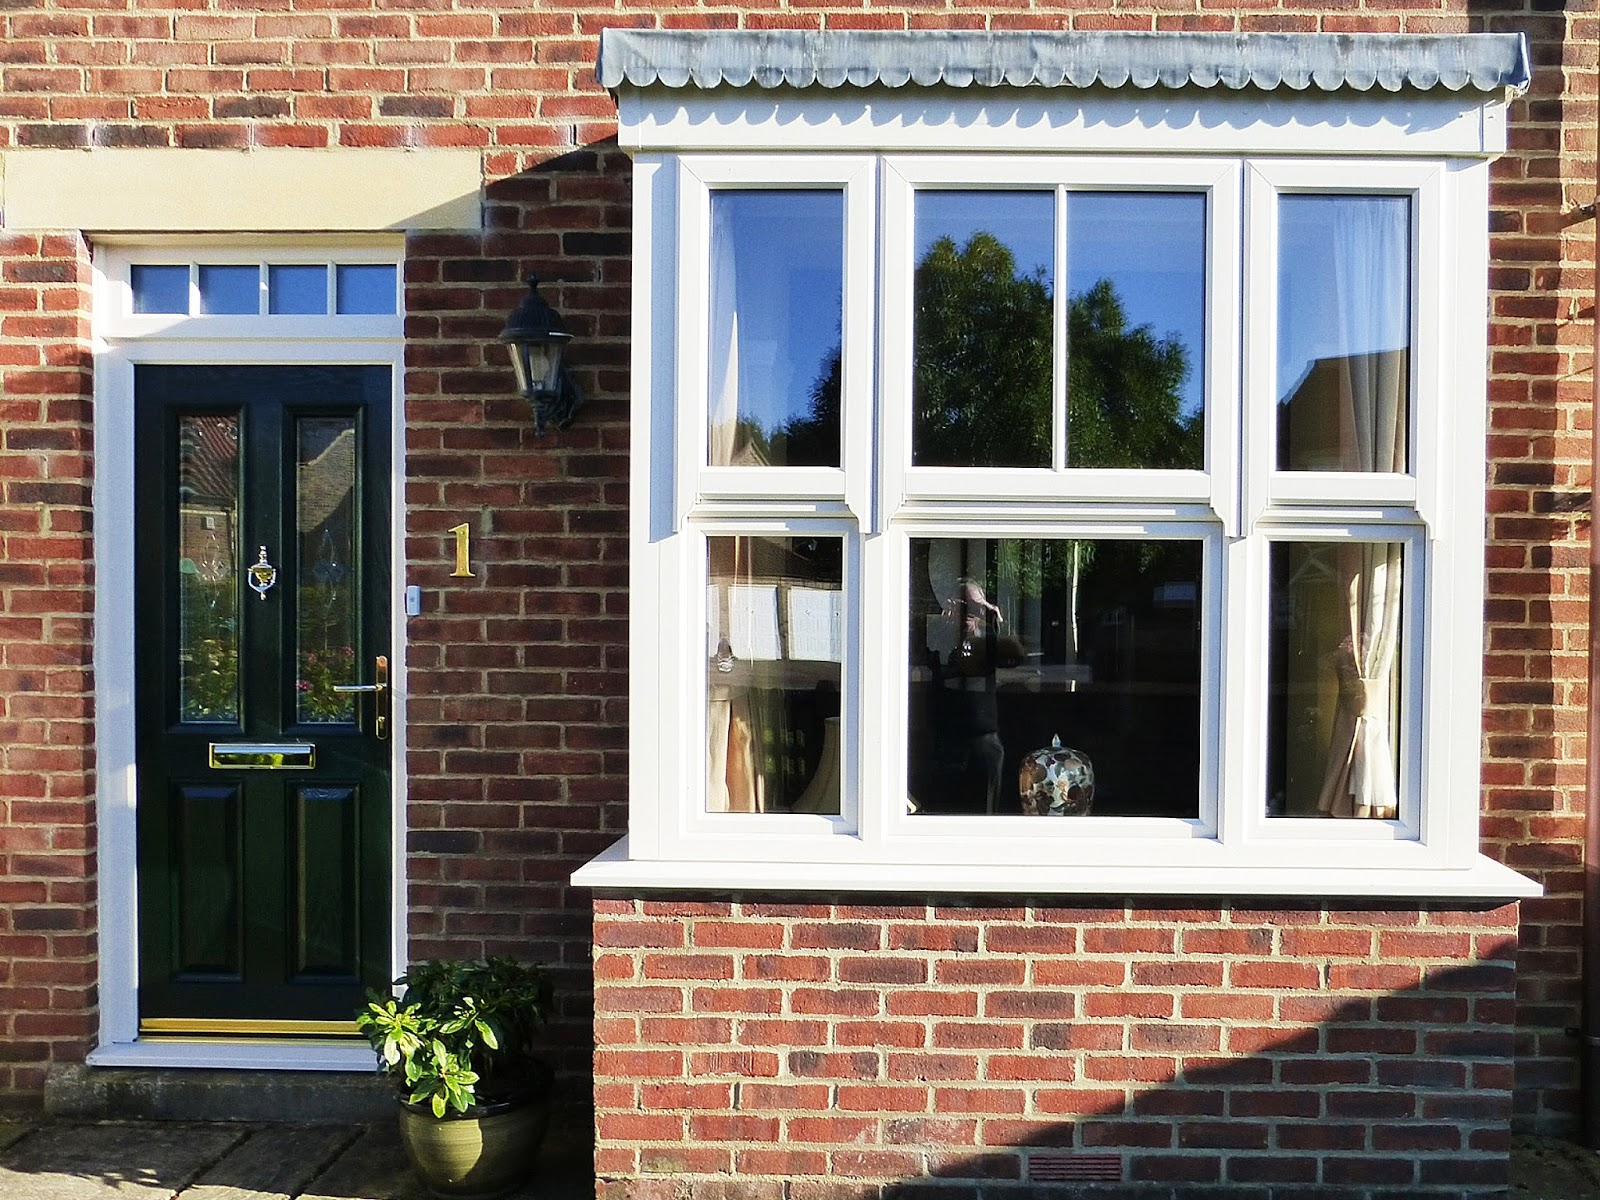 Beautiful Full house of Box Bay Sash Windows, and Green